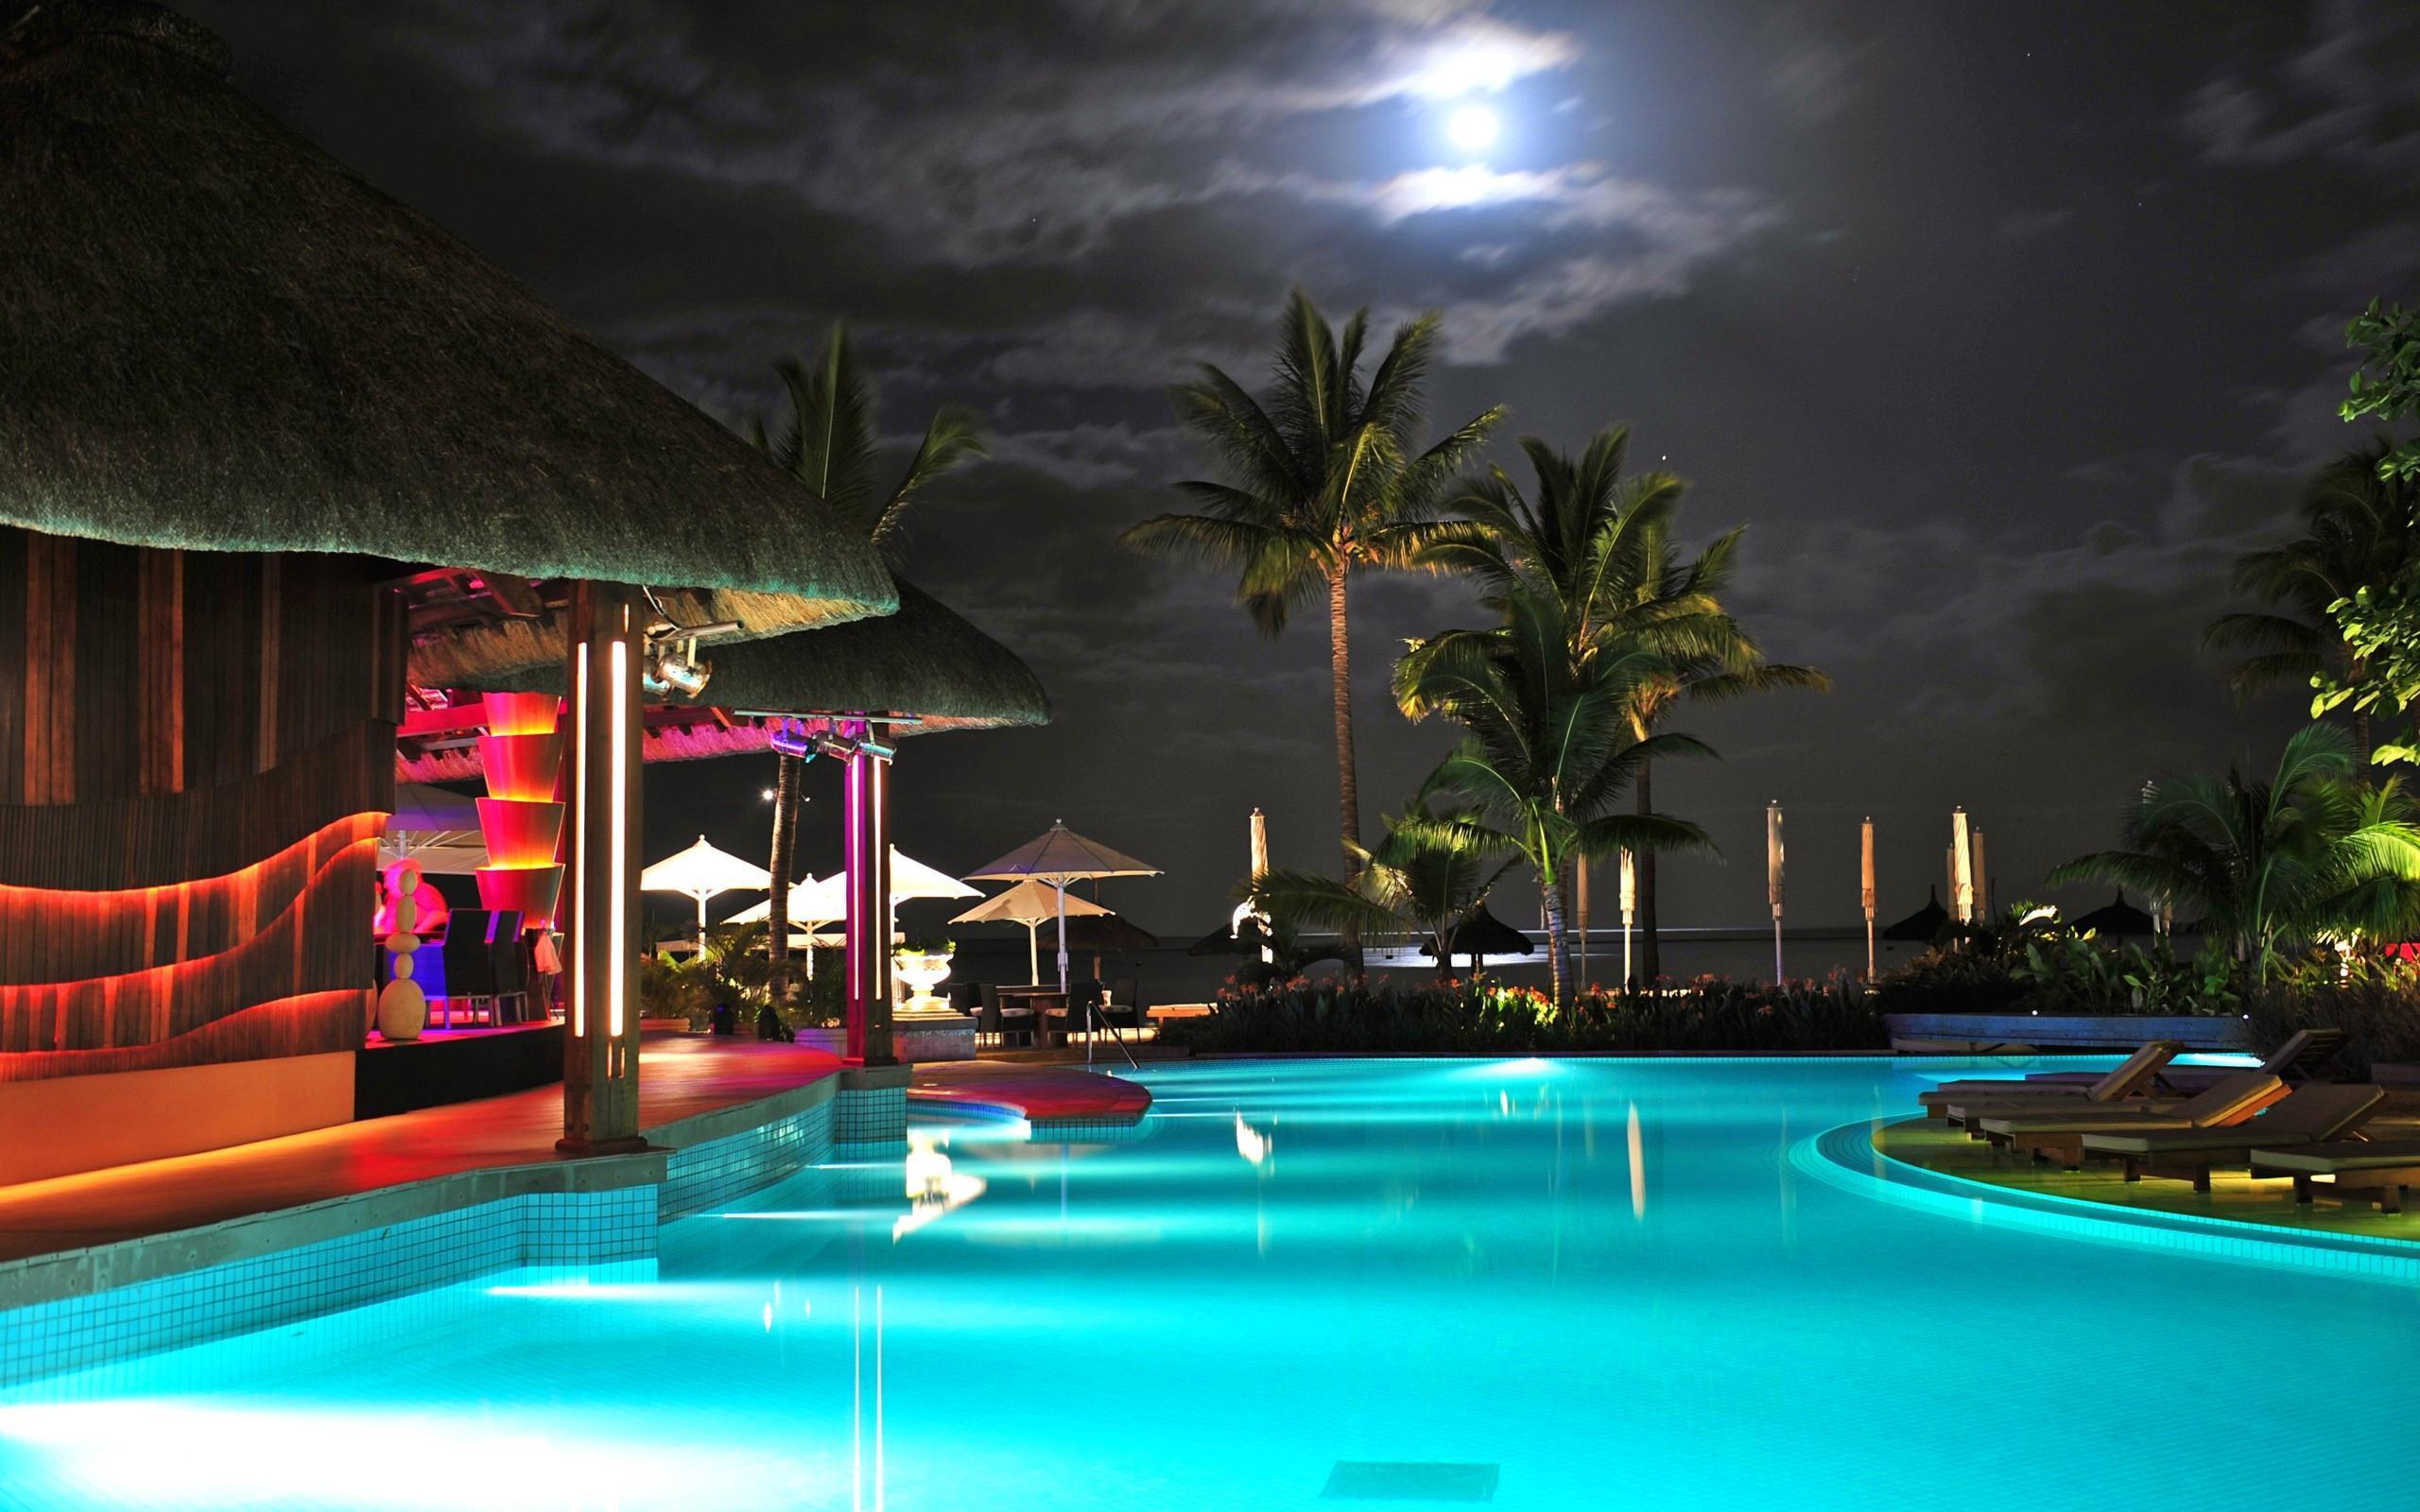 Swimming Pool At Night - Swimming Pool Night , HD Wallpaper & Backgrounds